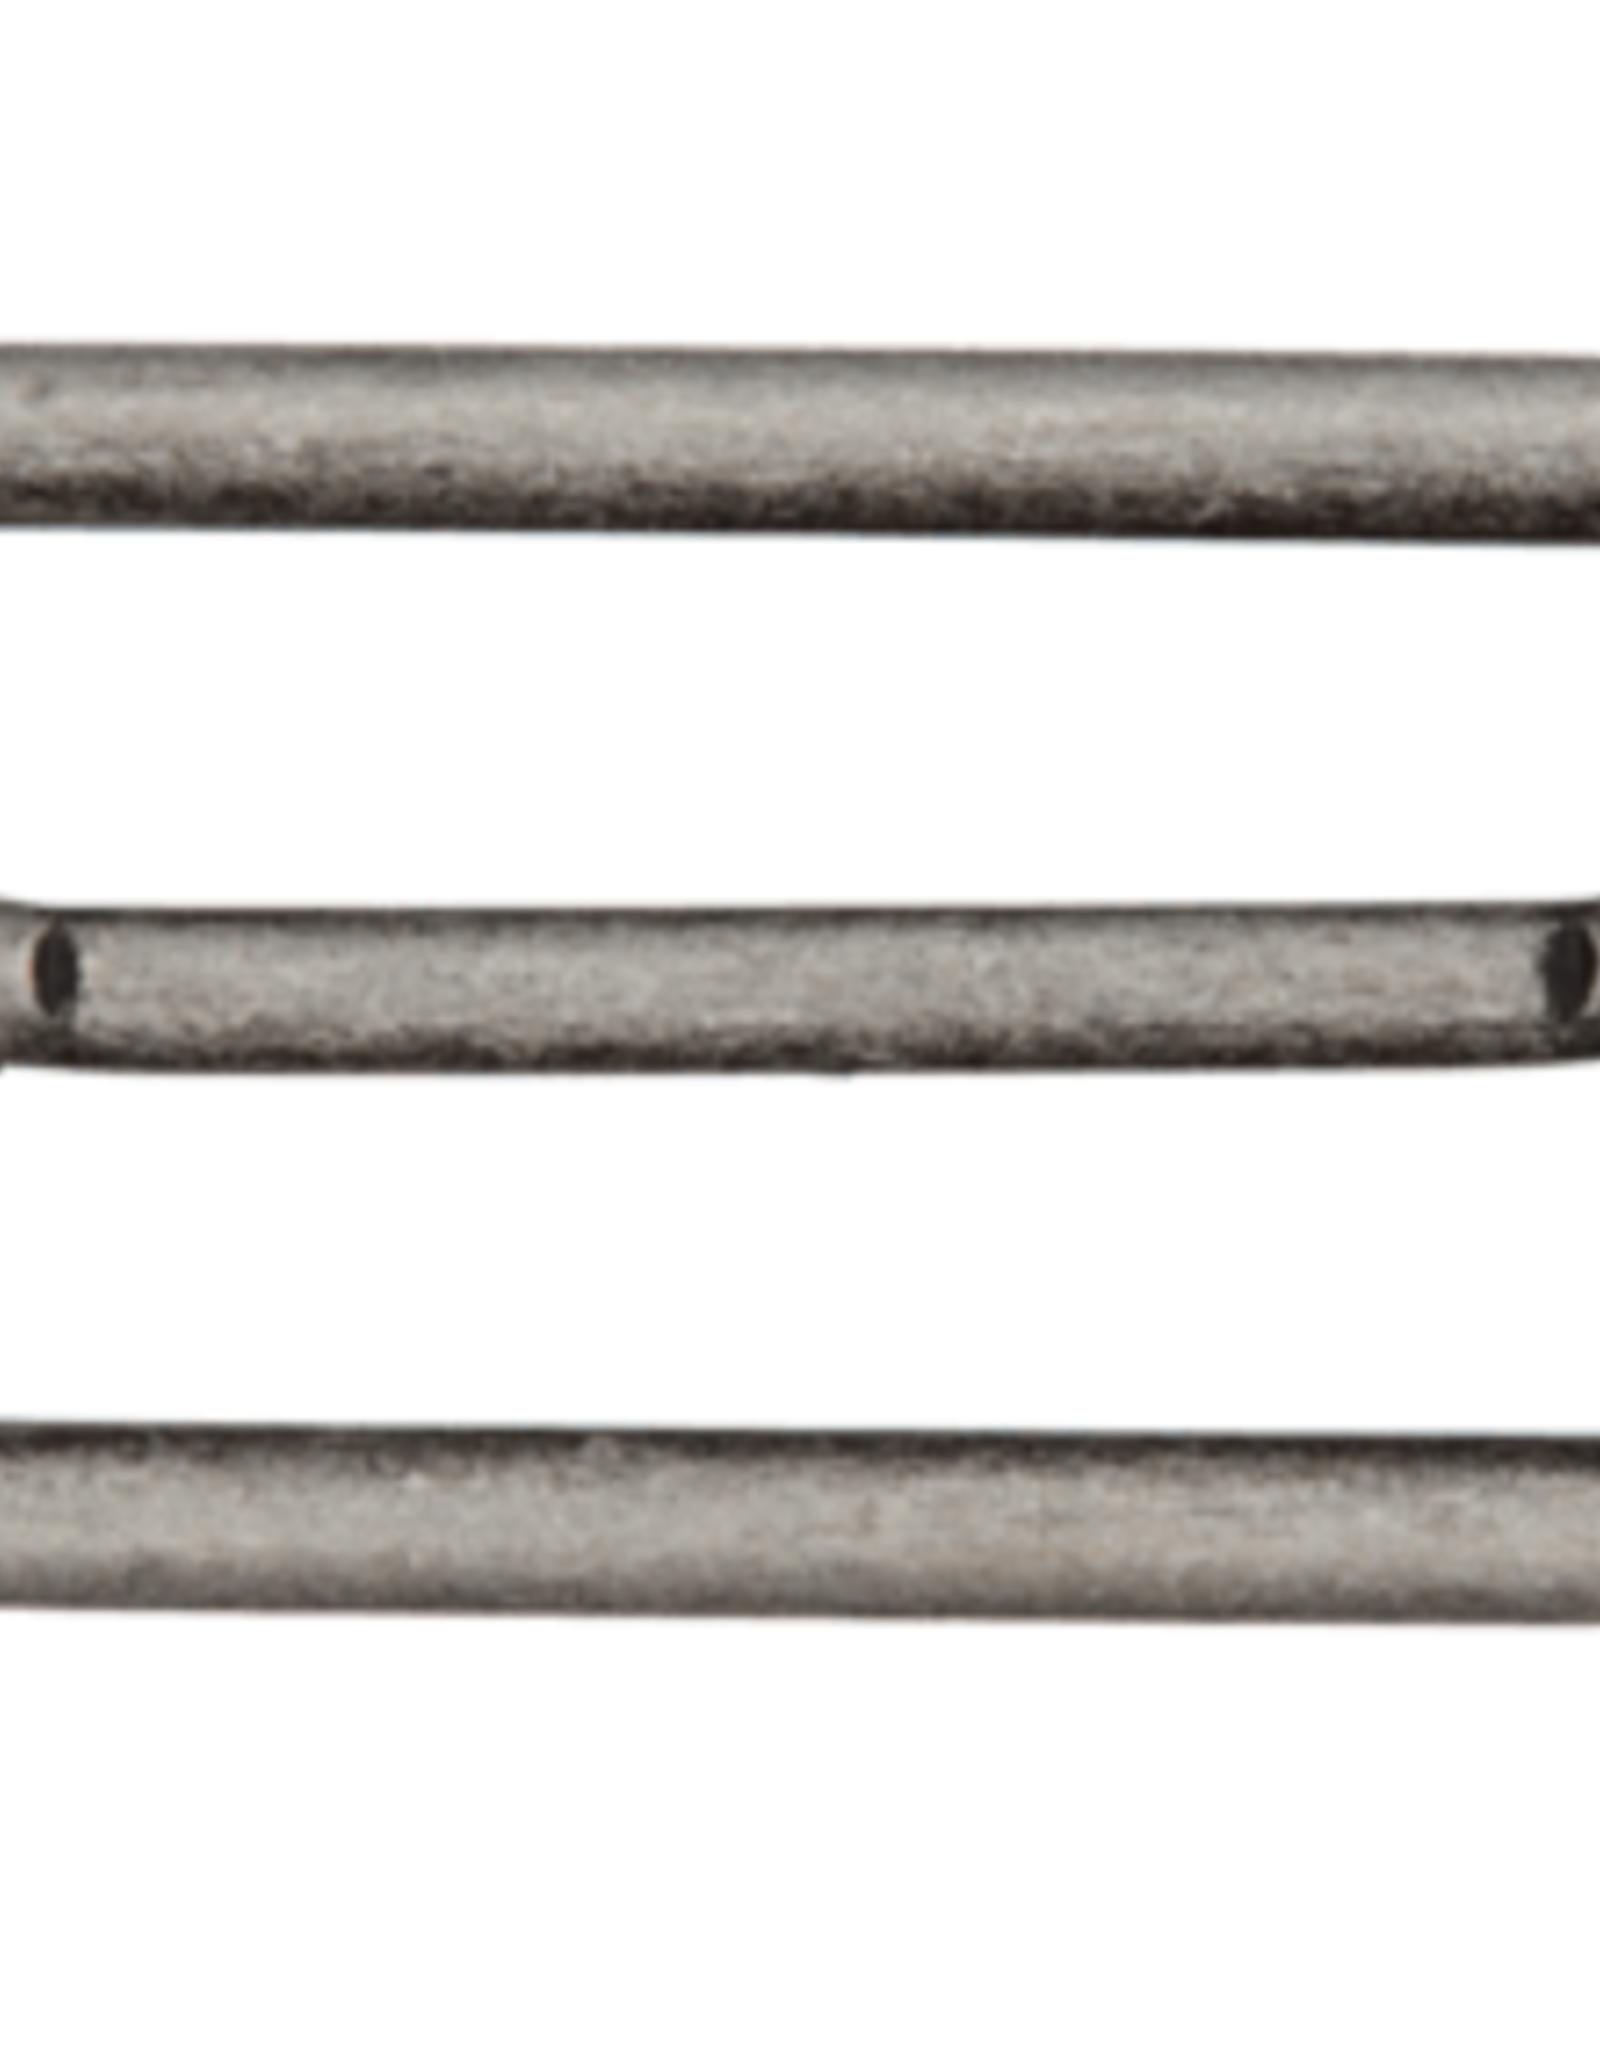 Schuifgesp 20mm - Grijs